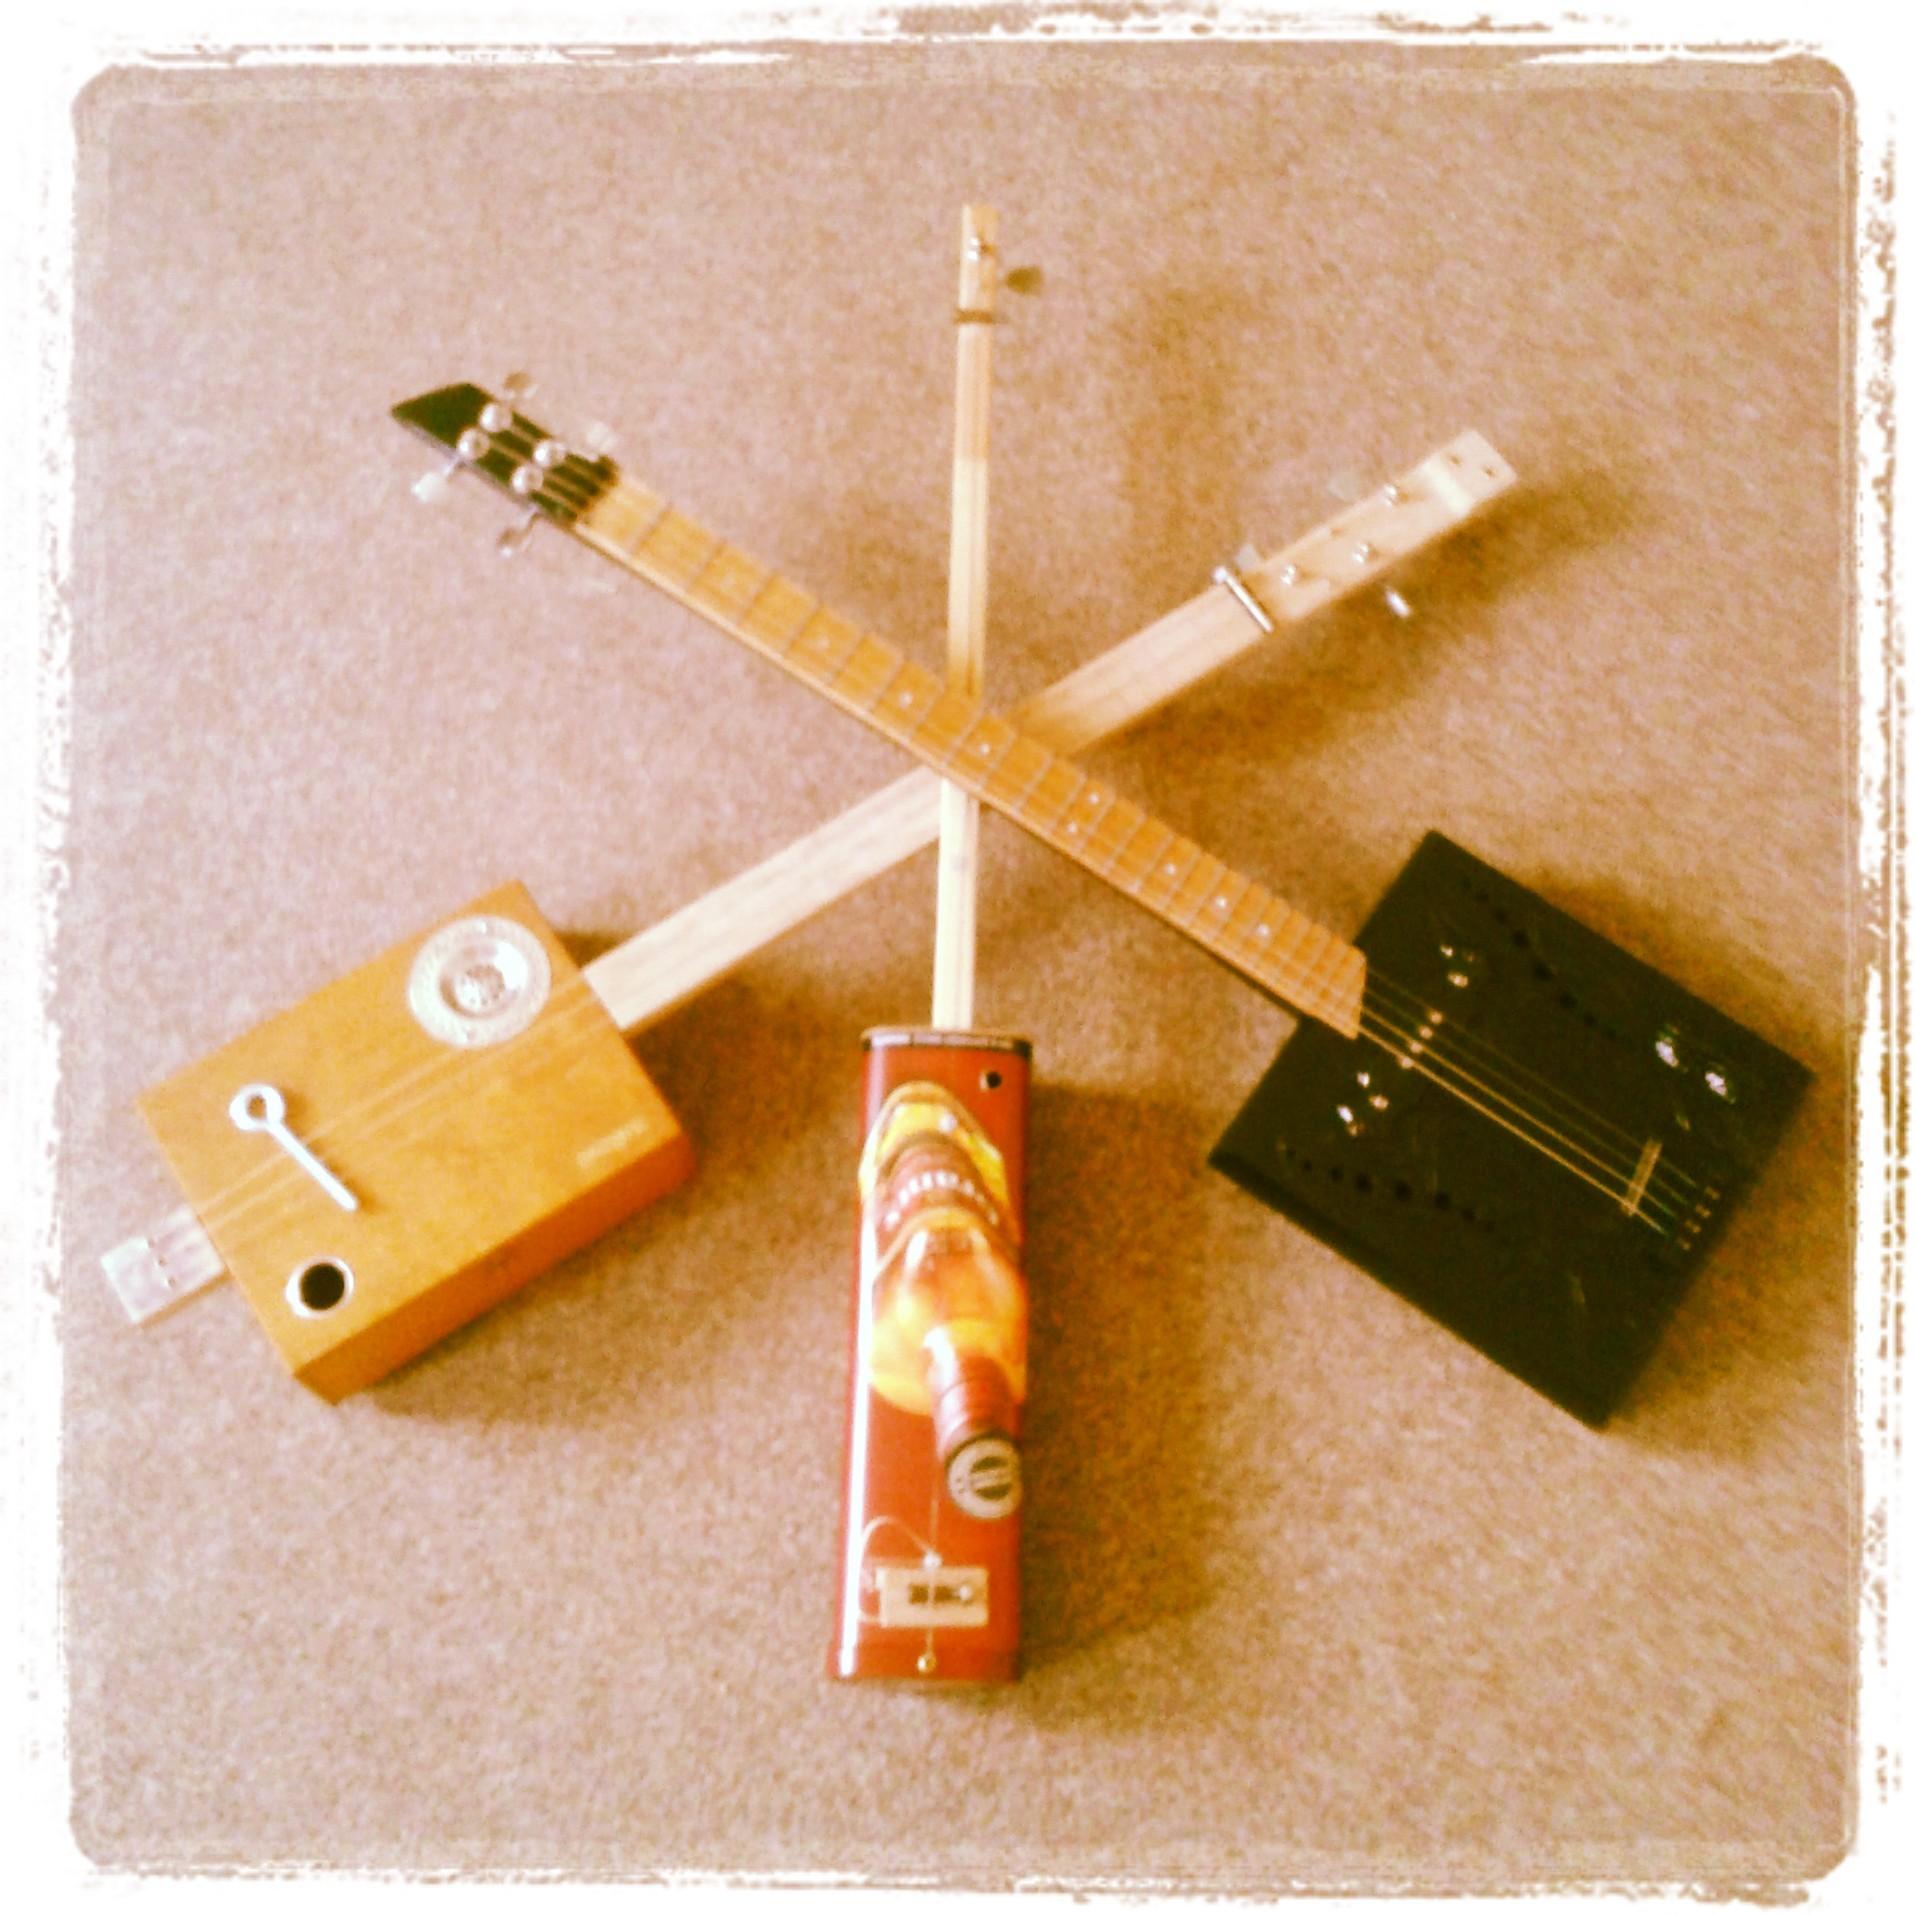 Smoking Sugar Lee aka Shalom